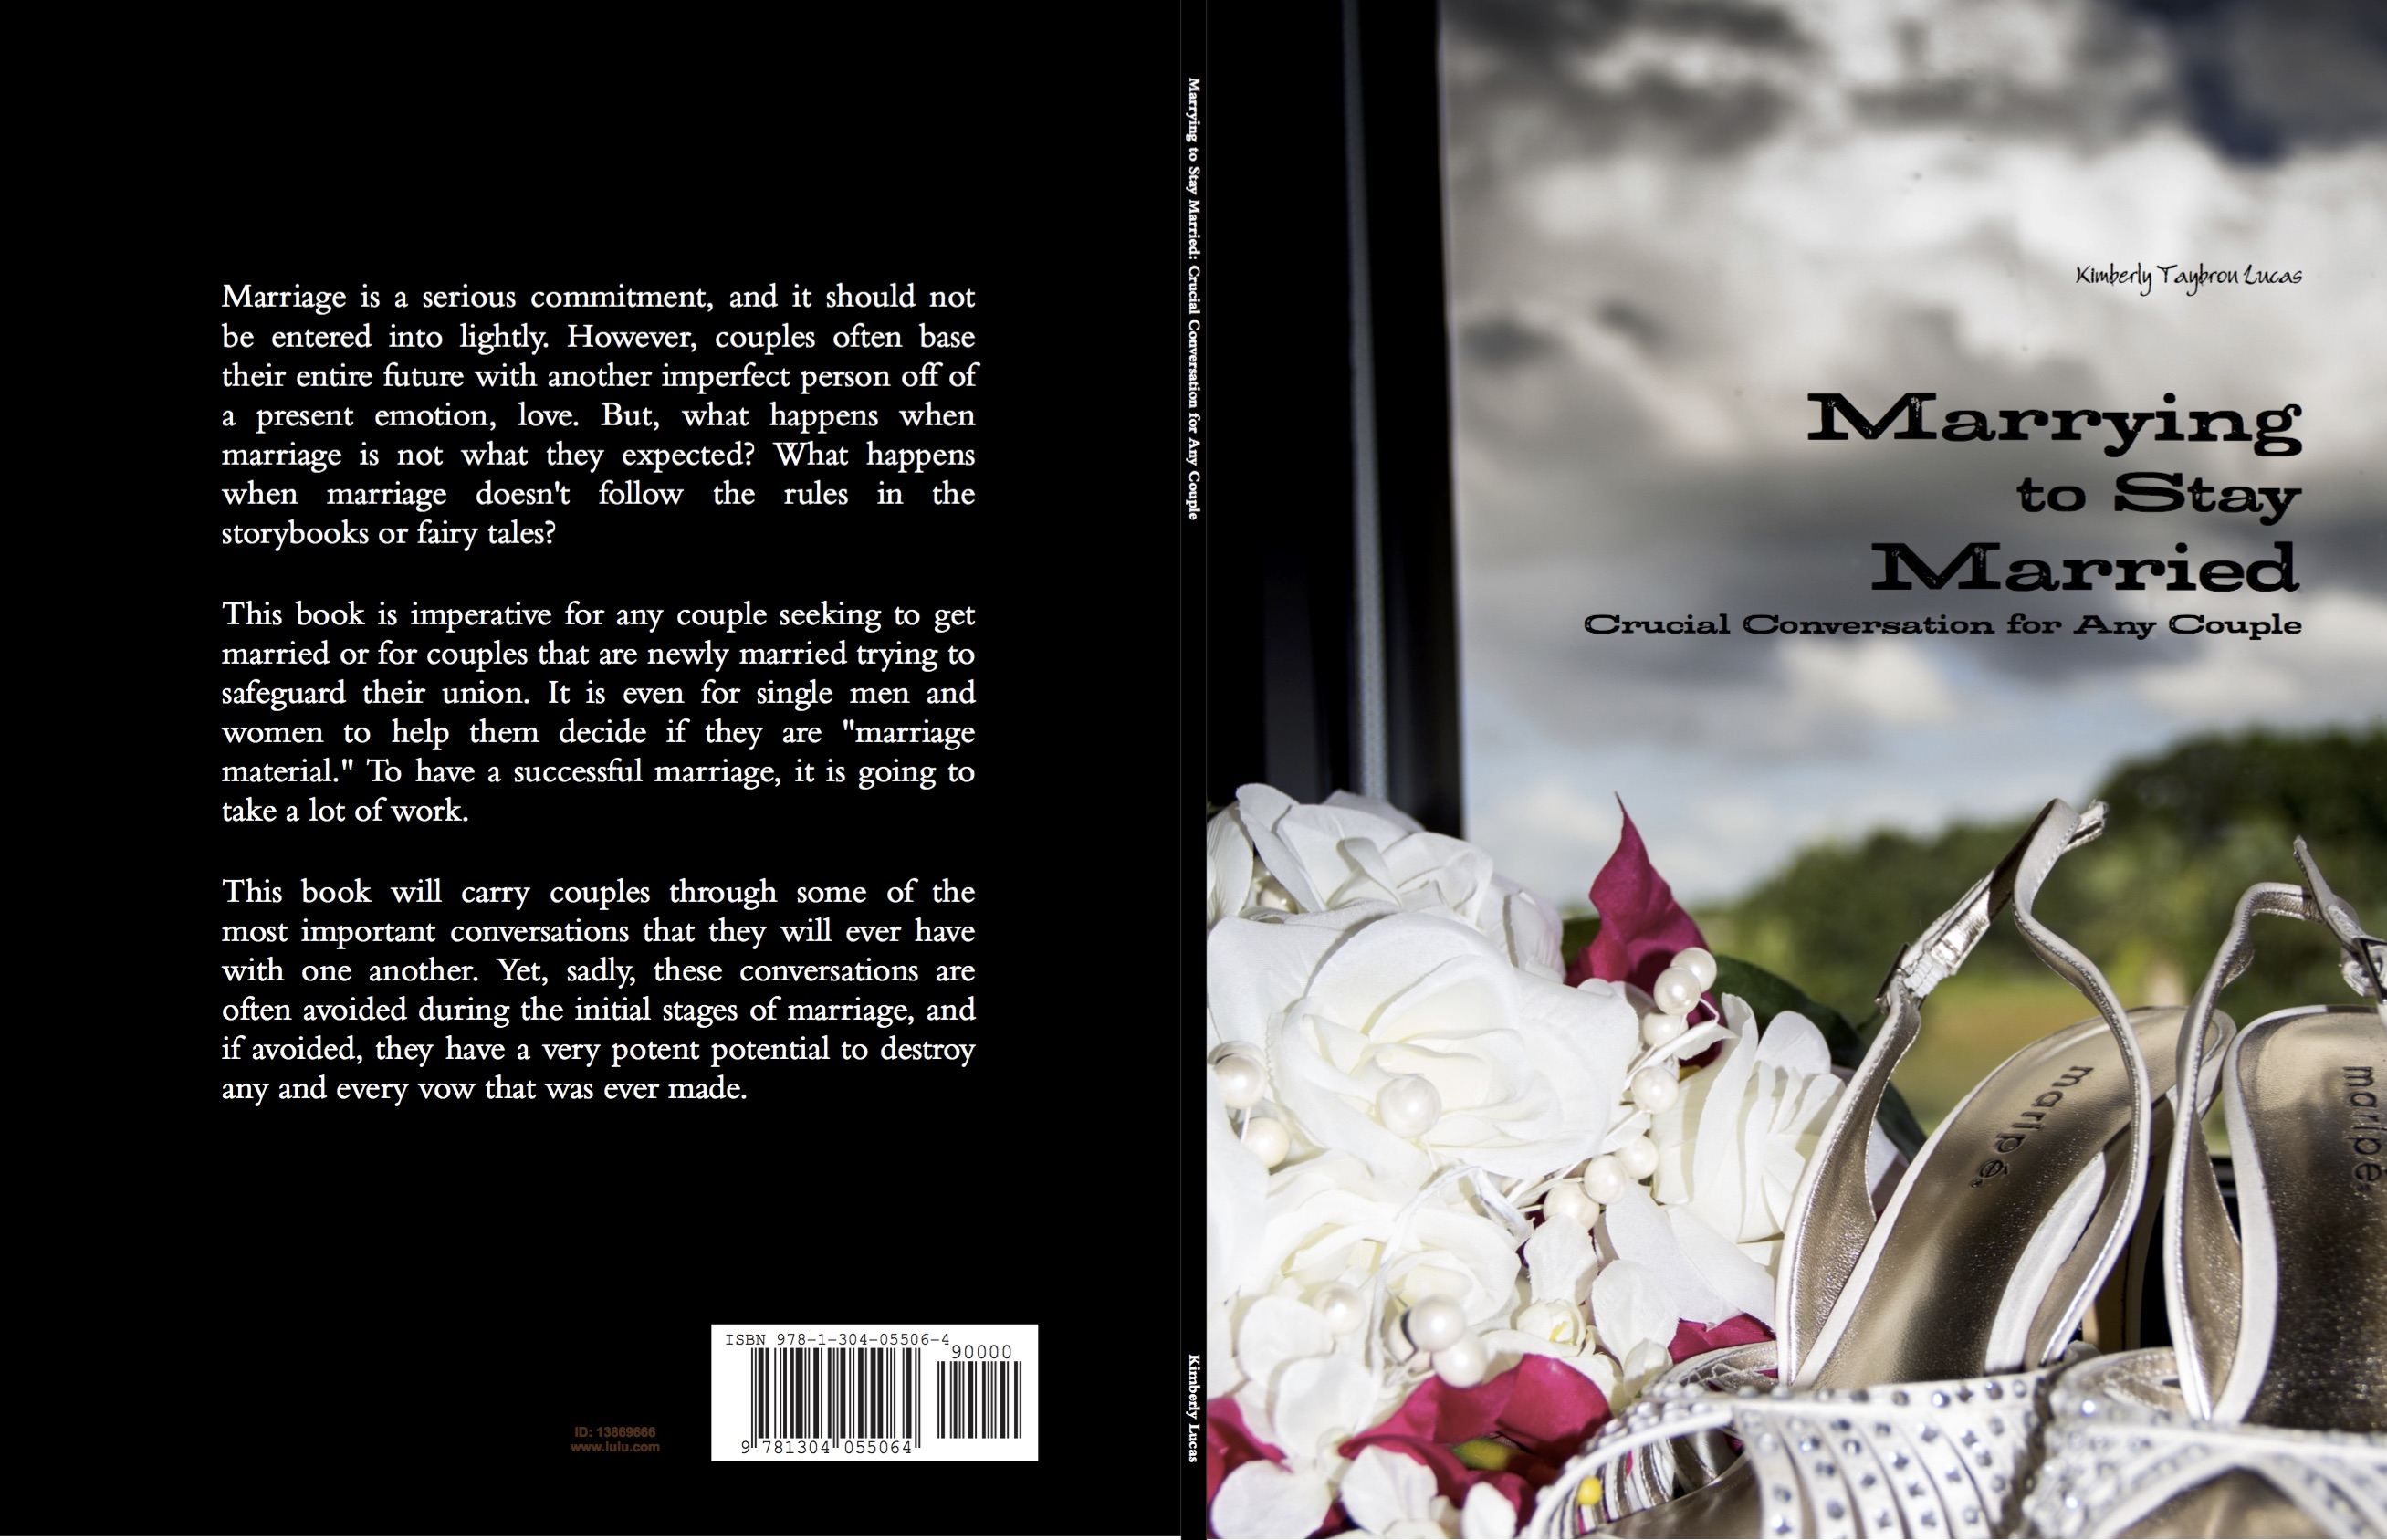 mtsm_cover